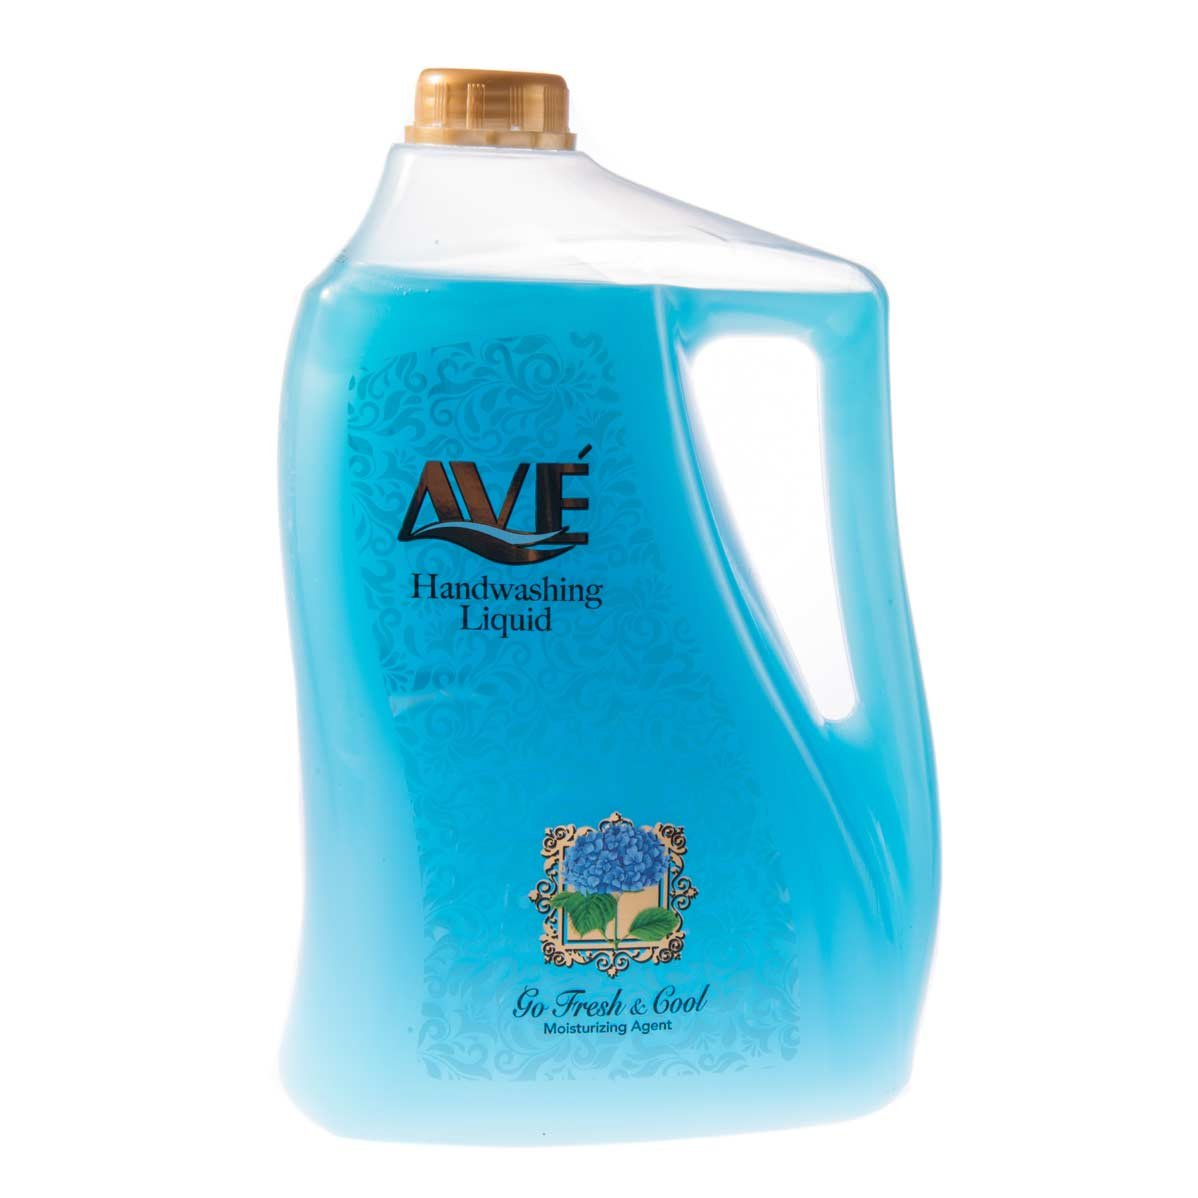 تصویر مایع دستشویی آبی اوه ۳.۷۵ کیلوگرمی -